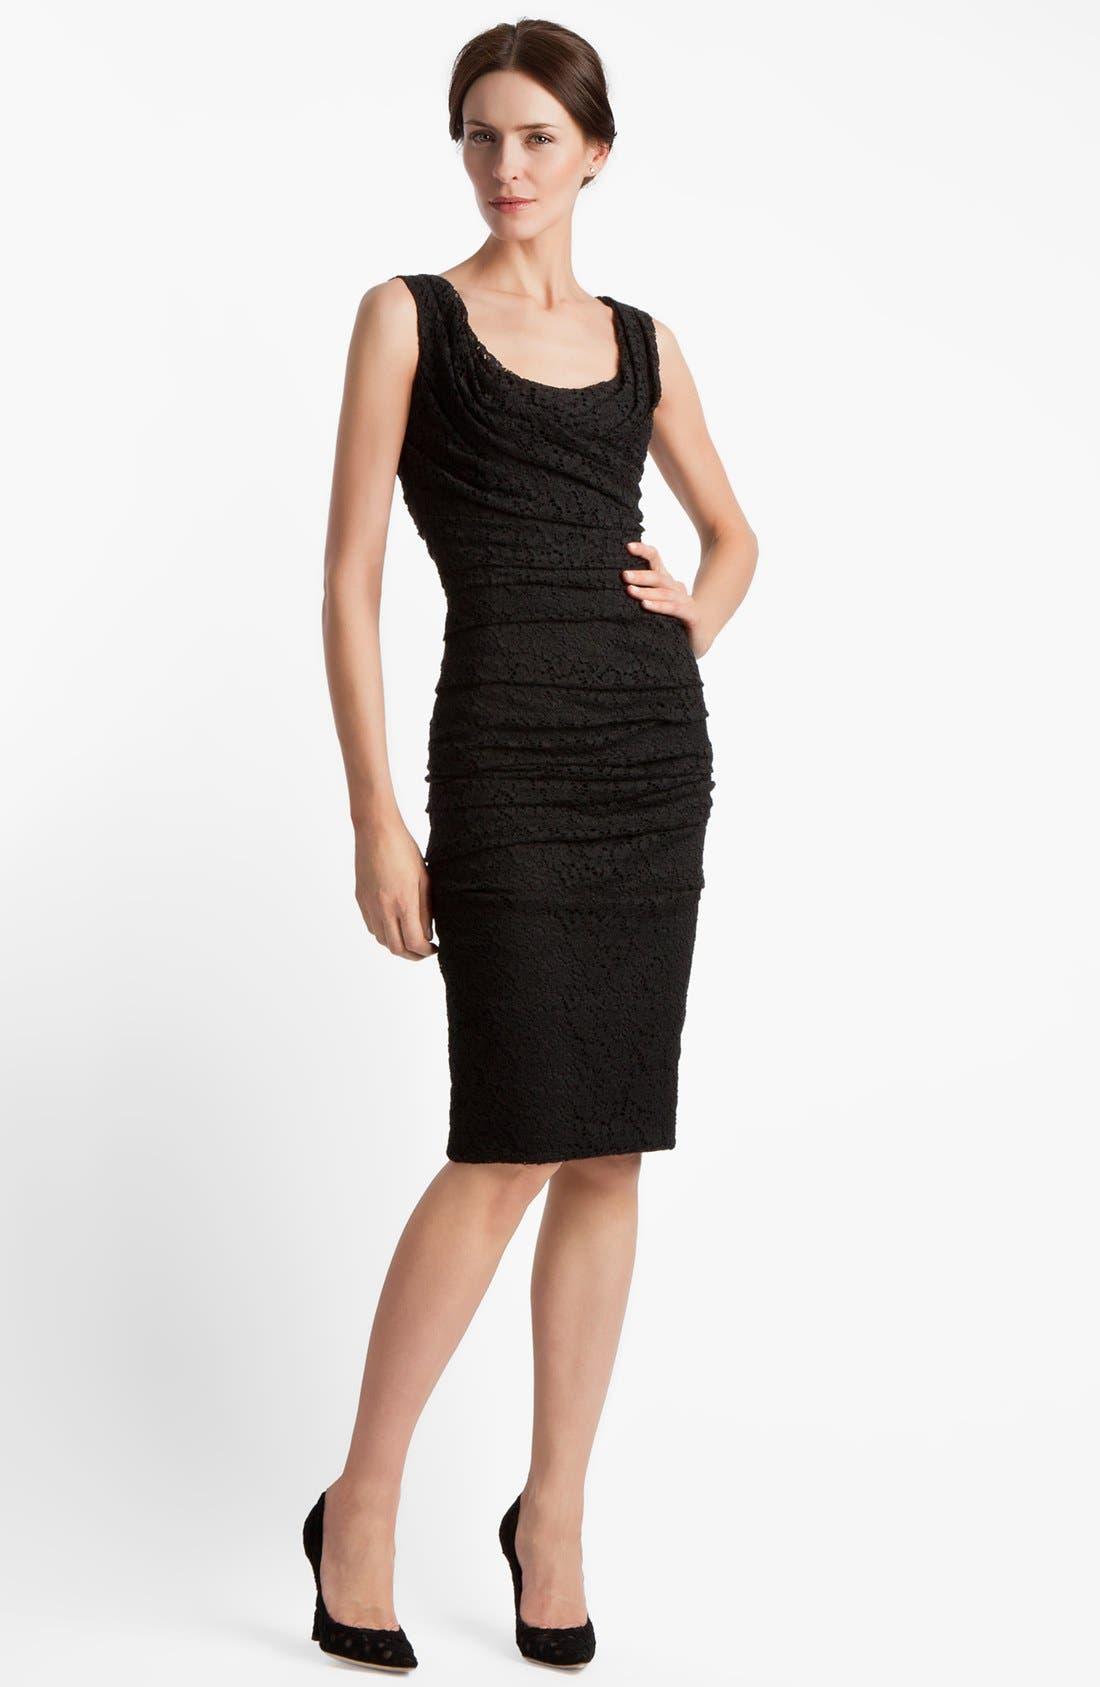 Main Image - Dolce&Gabbana Ruched Stretch Lace Dress